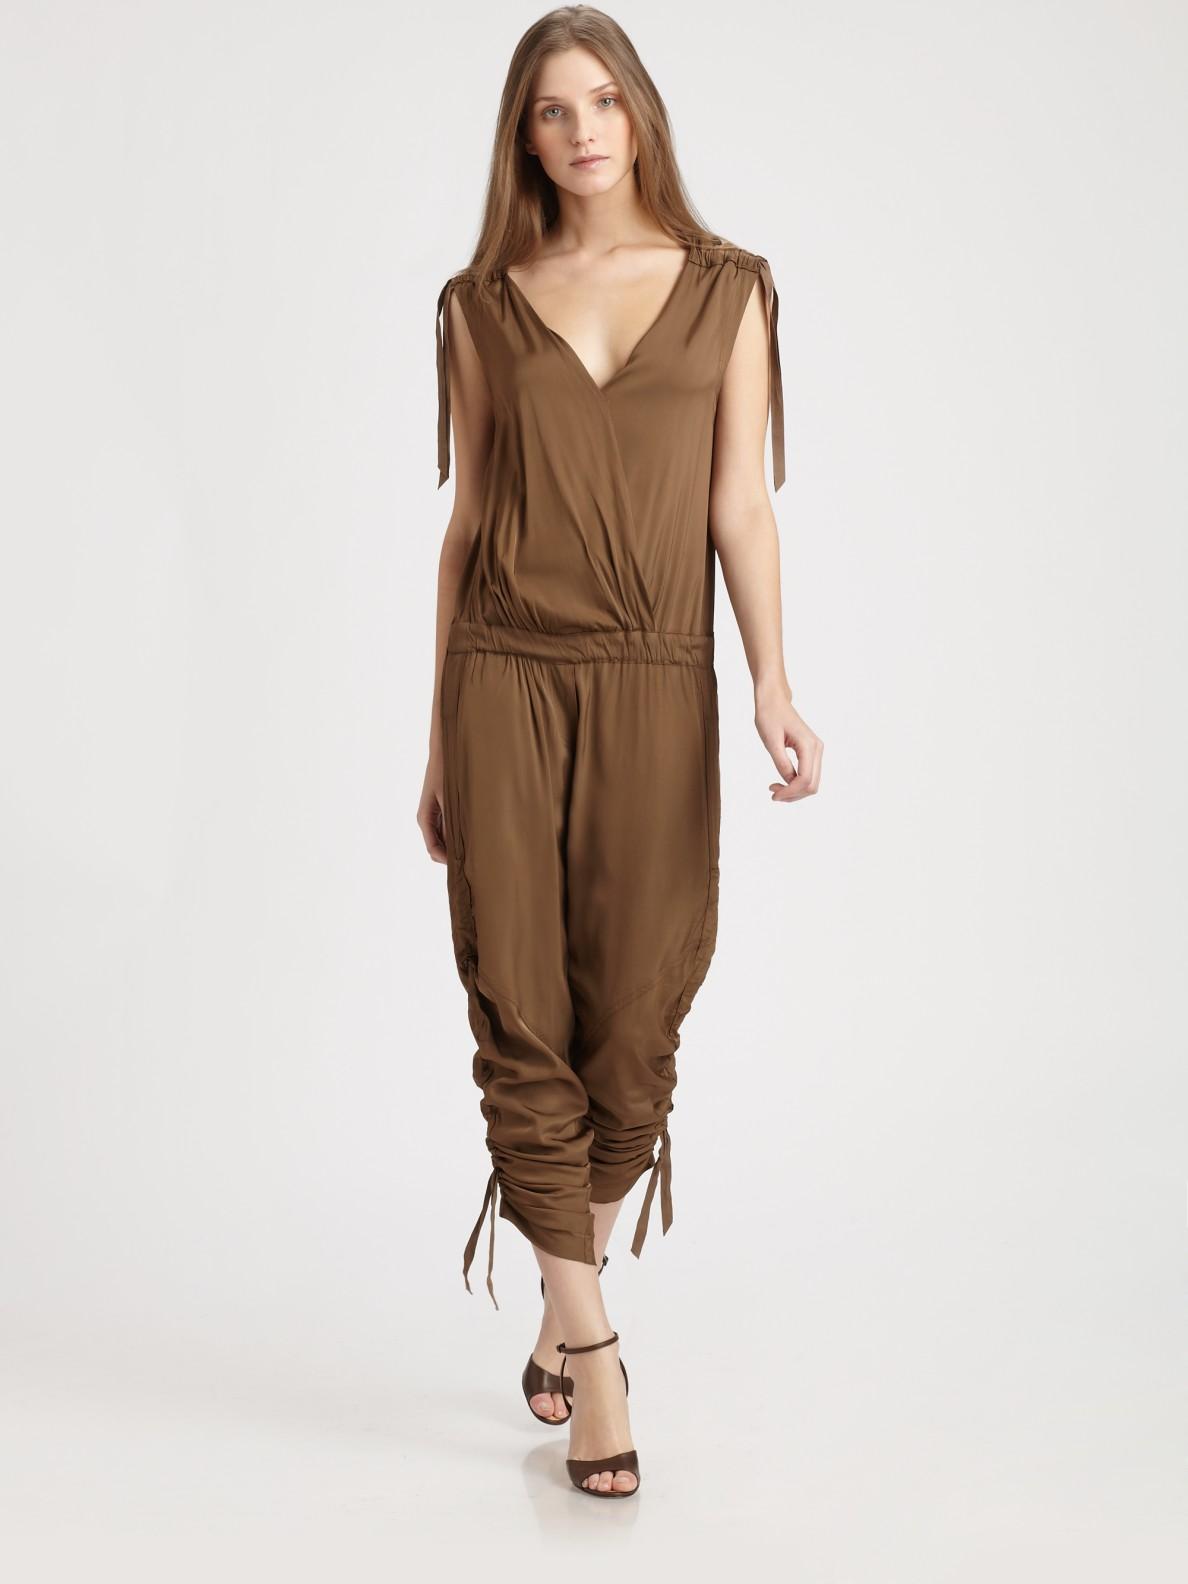 Donna karan new york draped jumpsuit in brown lyst for Donna karan new york